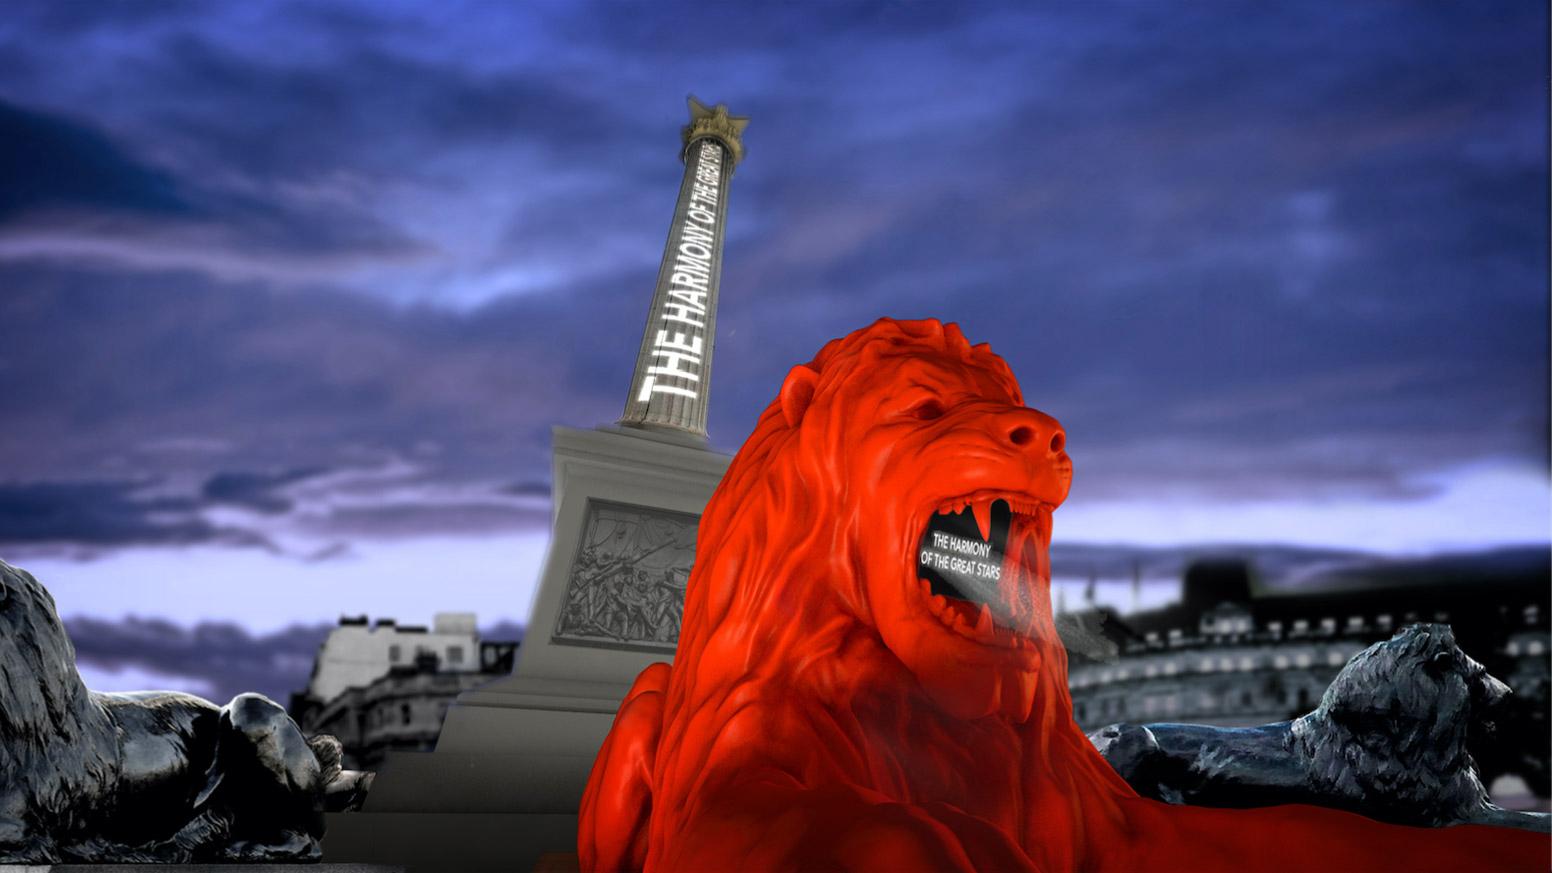 es-devlin-please-feed-the-lions-trafalga-square-design_col_2.jpg